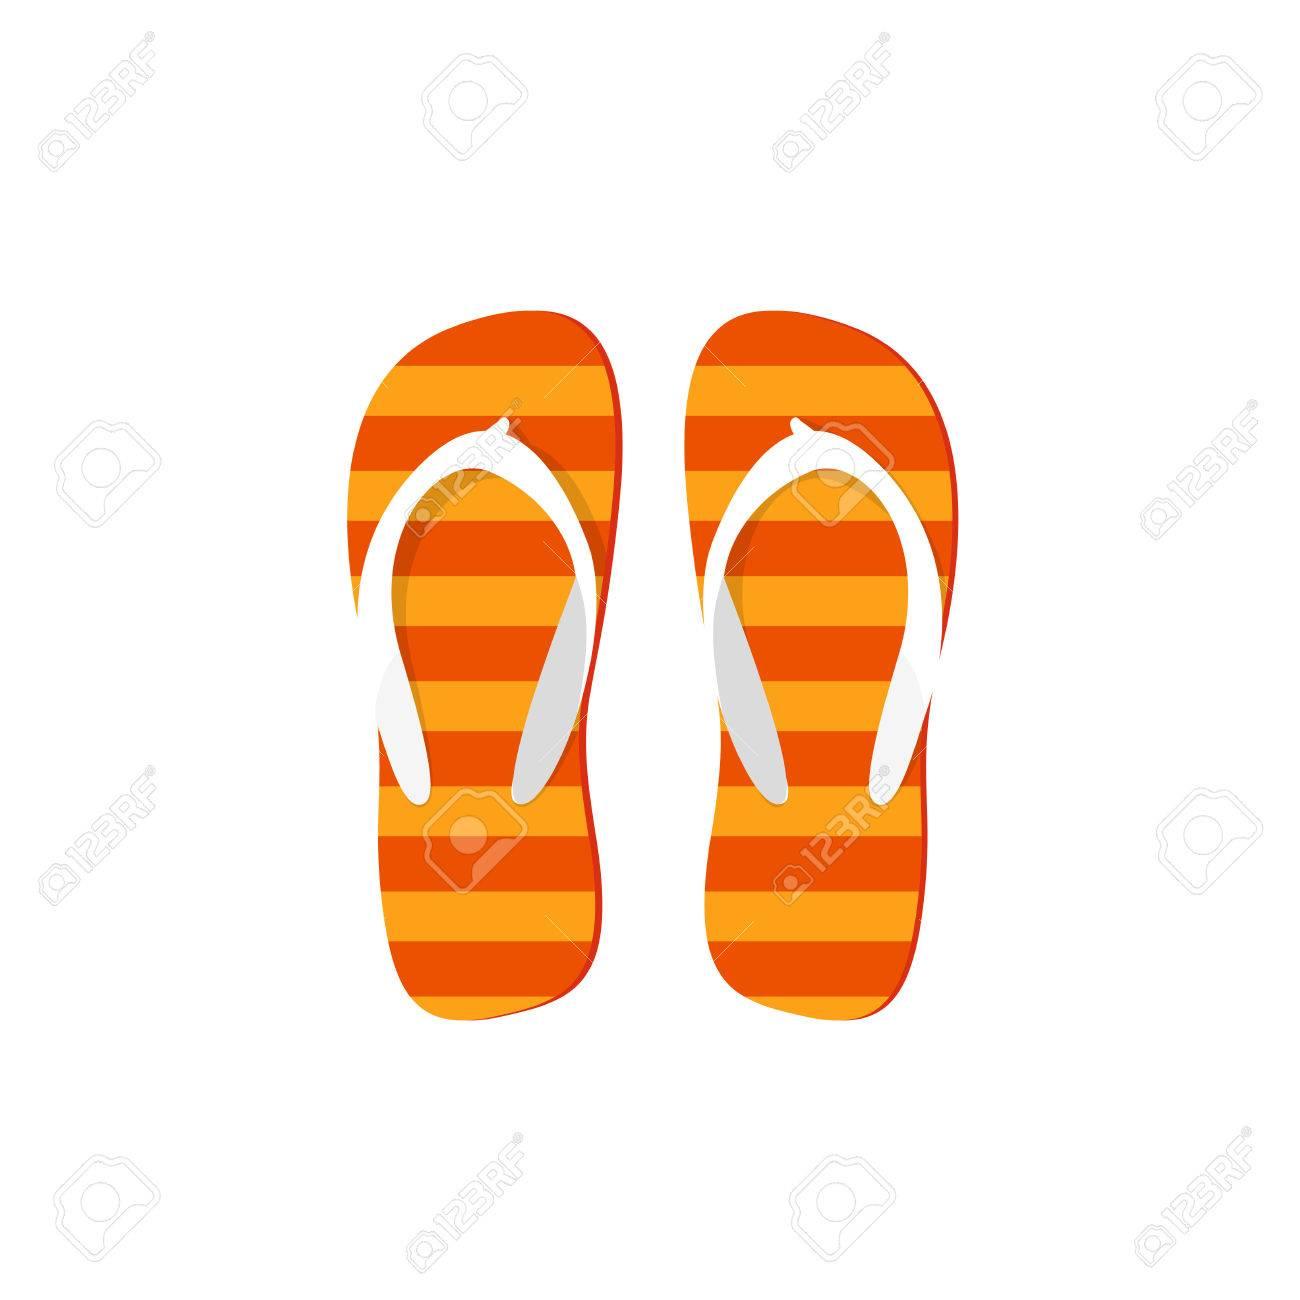 a451285d2df57 Orange Flip-flops Vector Illustration Isolated On White Background ...